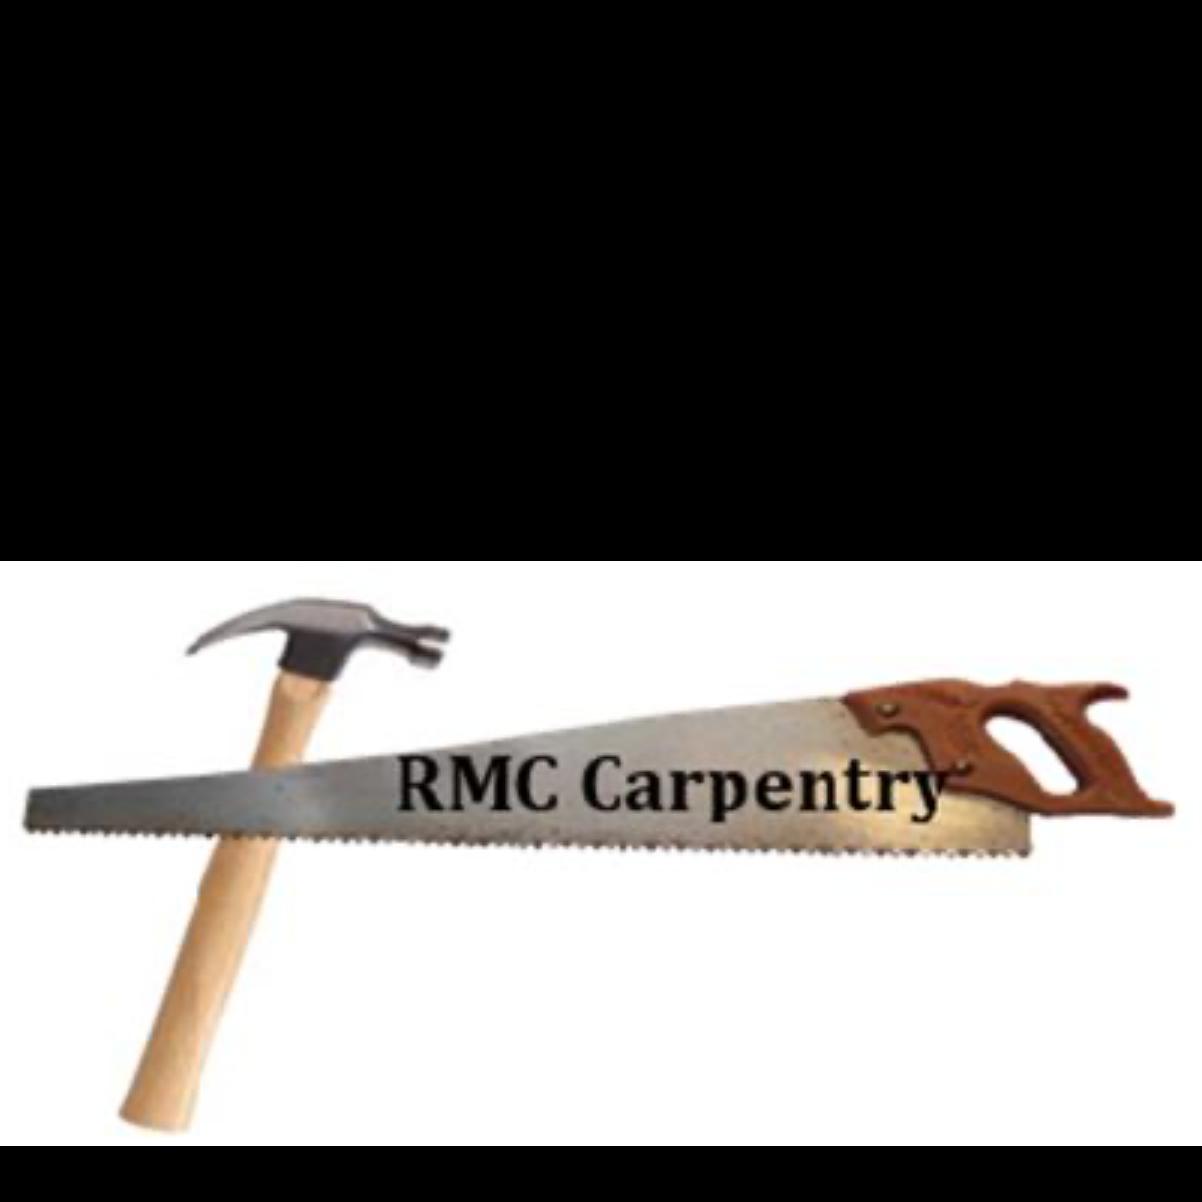 RMC Carpentry